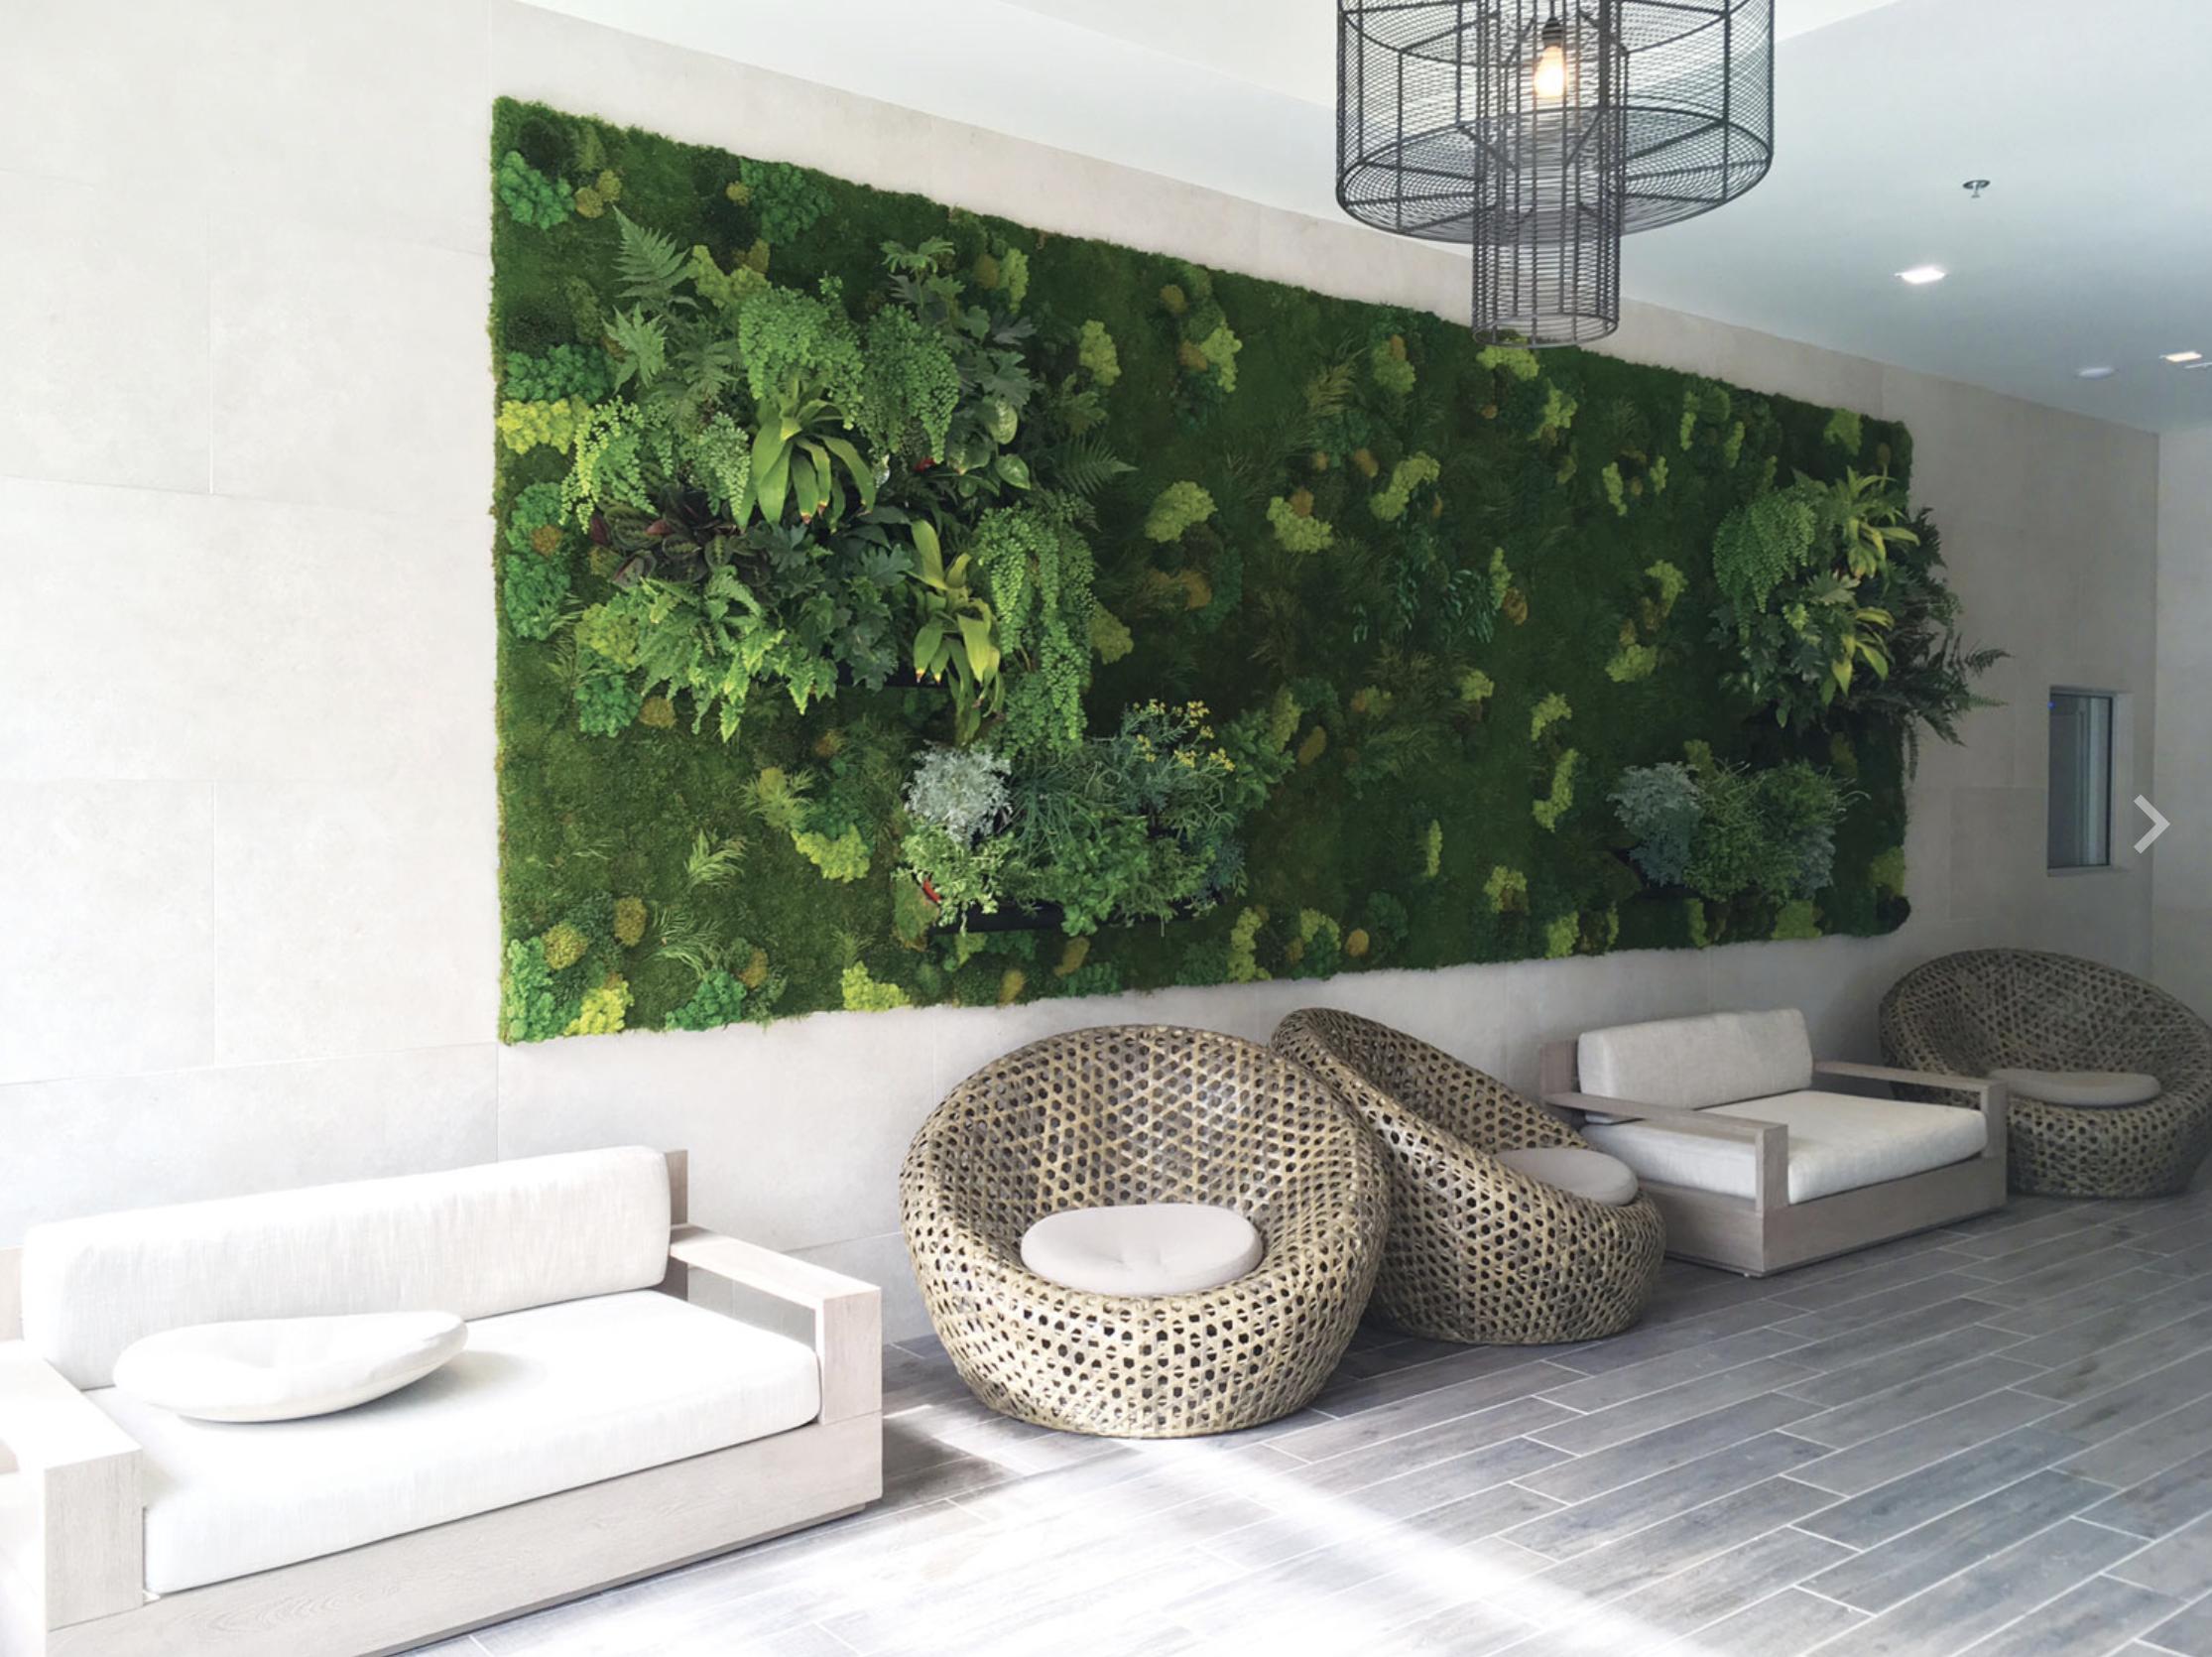 Stunning 15u0027 X 7u0027   Living Wall